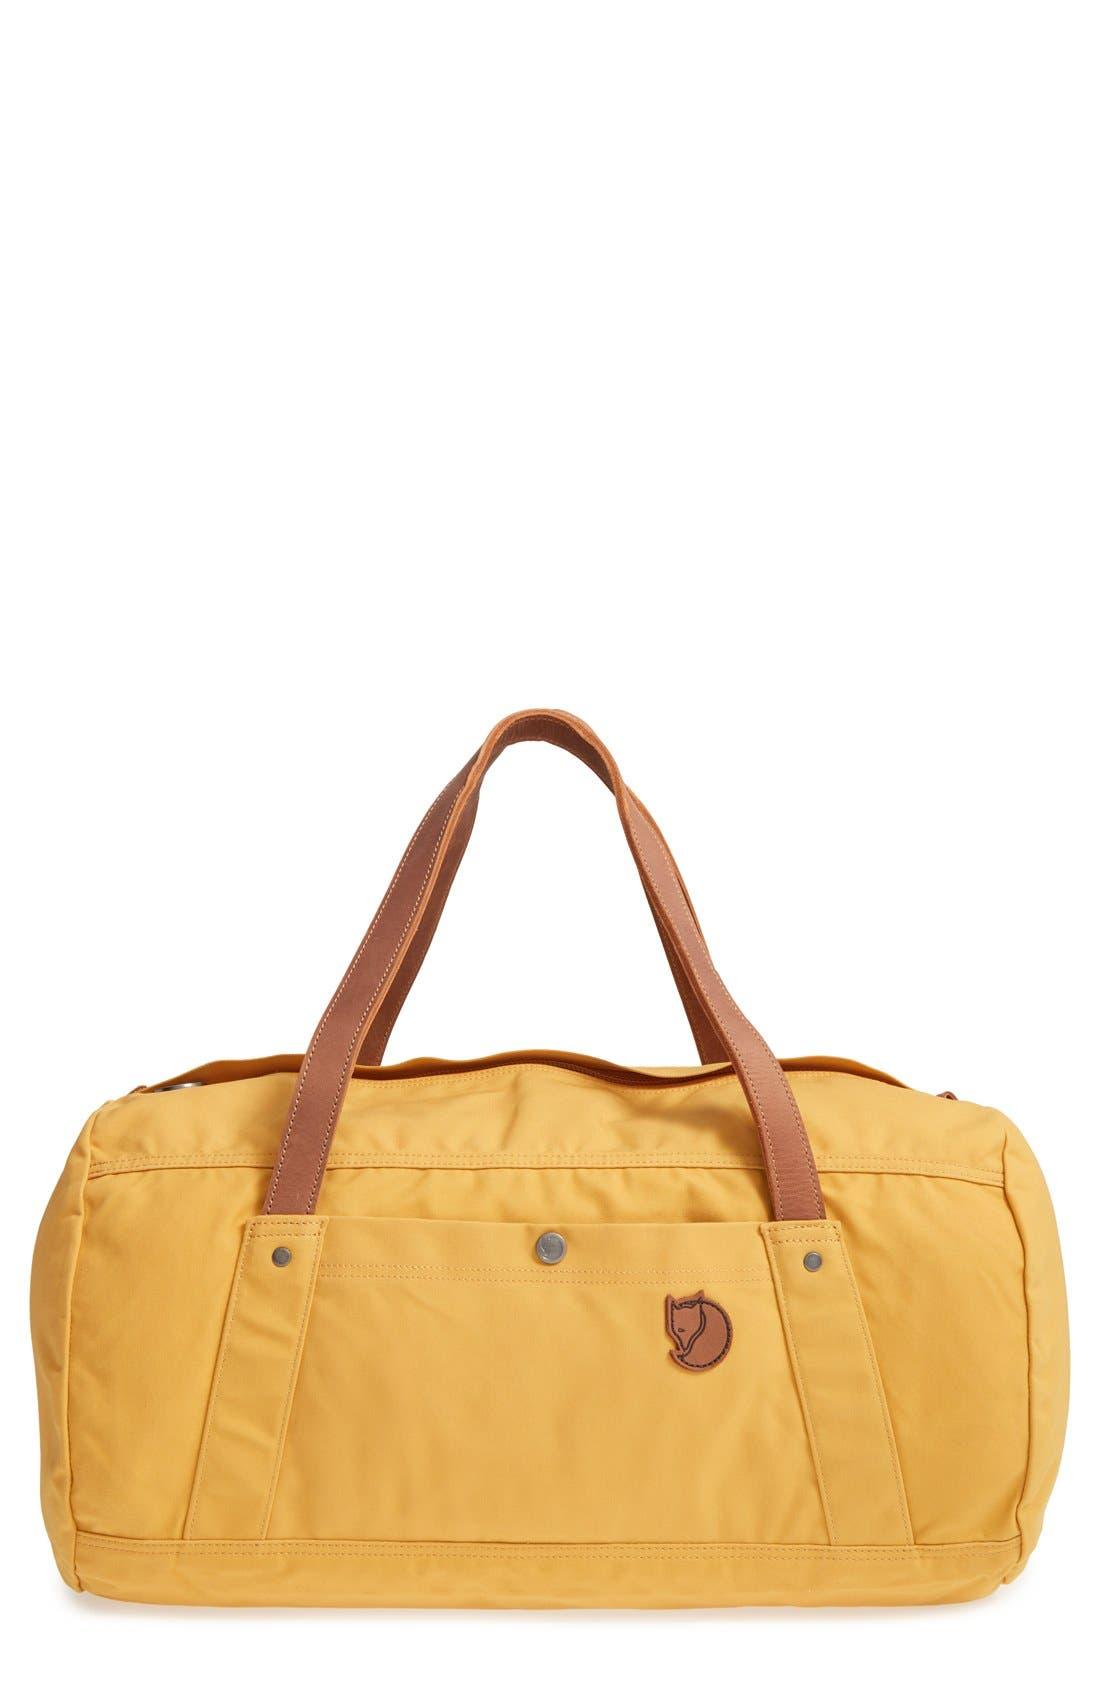 Fjällräven 'Duffel No.4' Water Resistant Duffel Bag